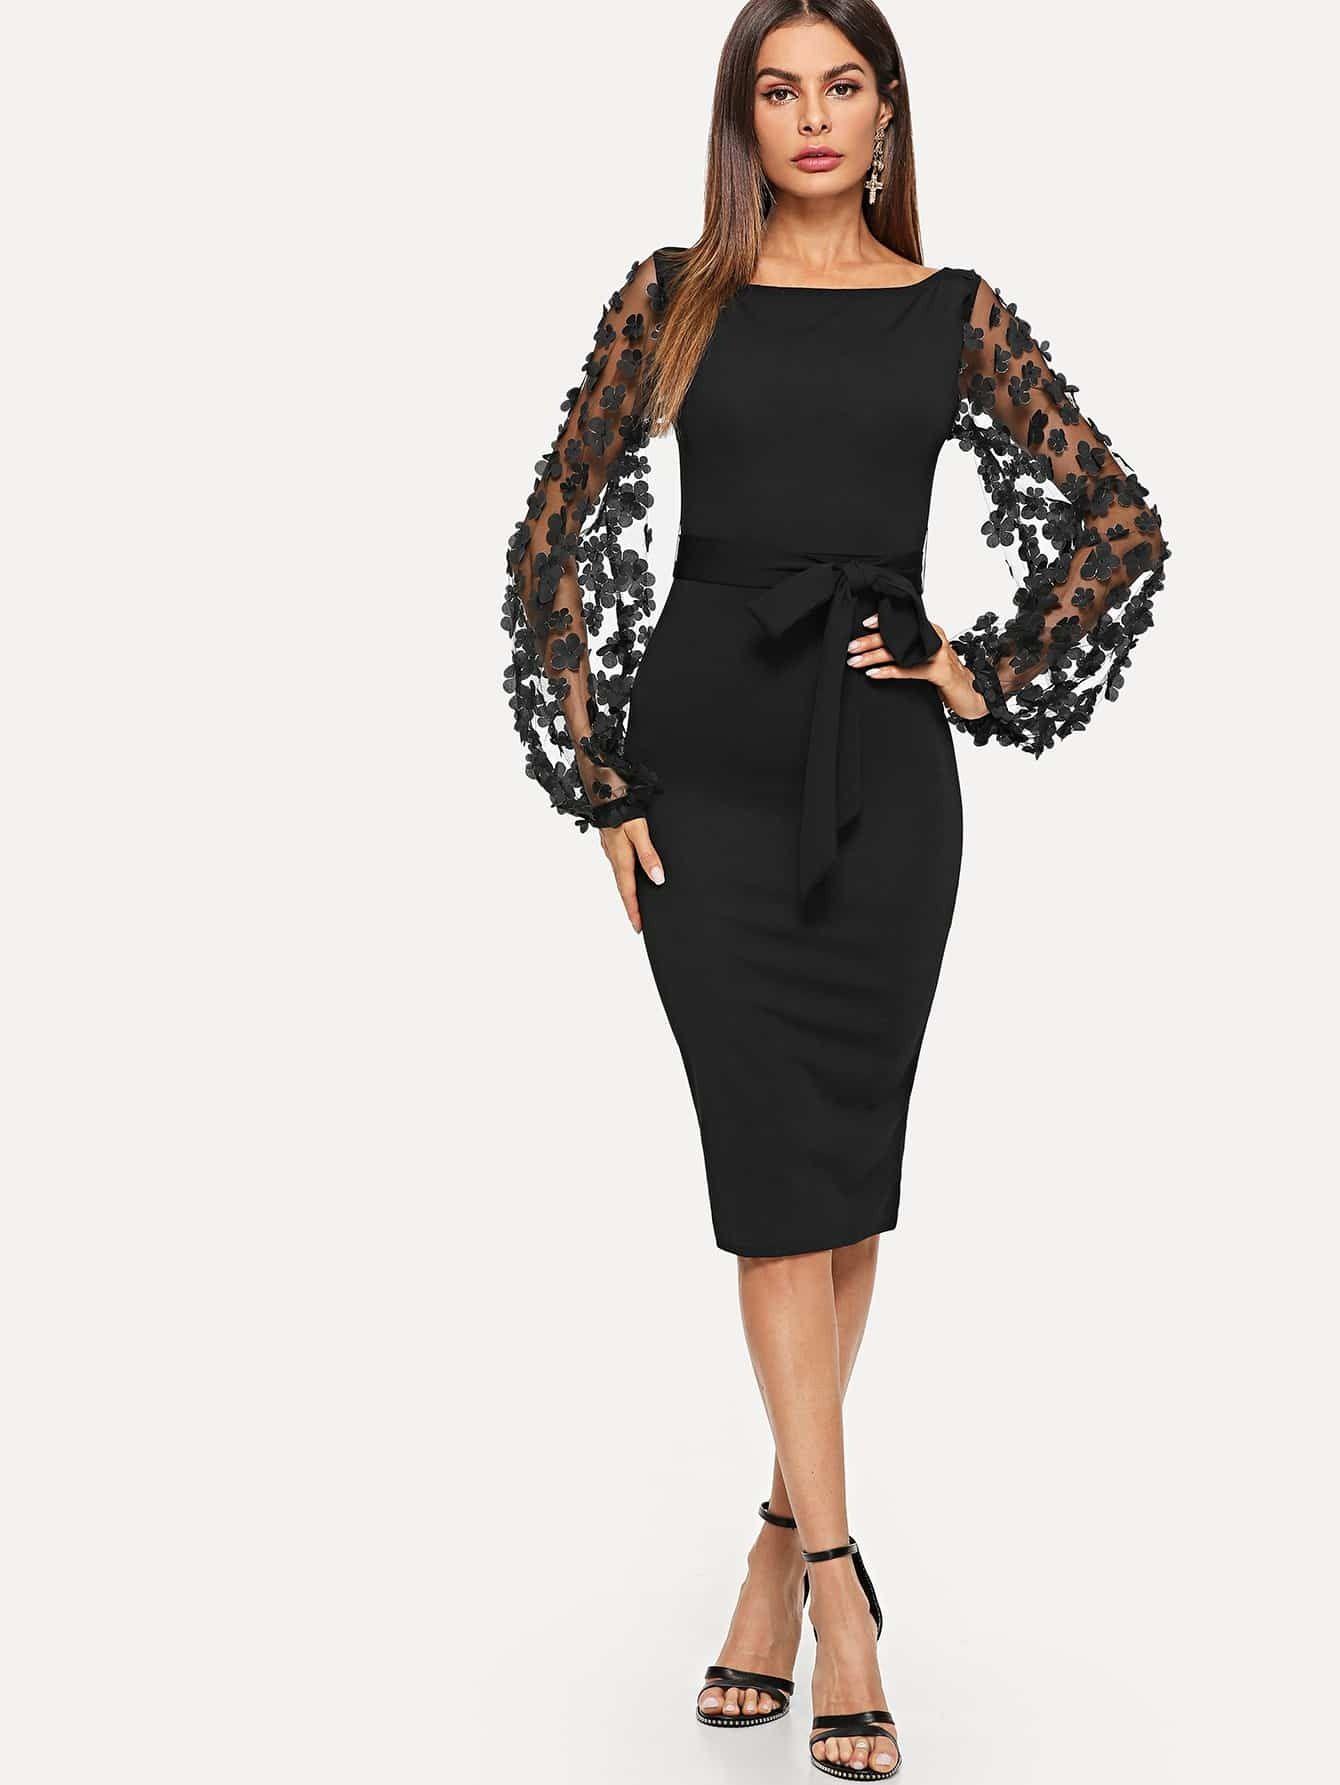 3d applique mesh sleeve self tie dress in 2020 | kleid mit